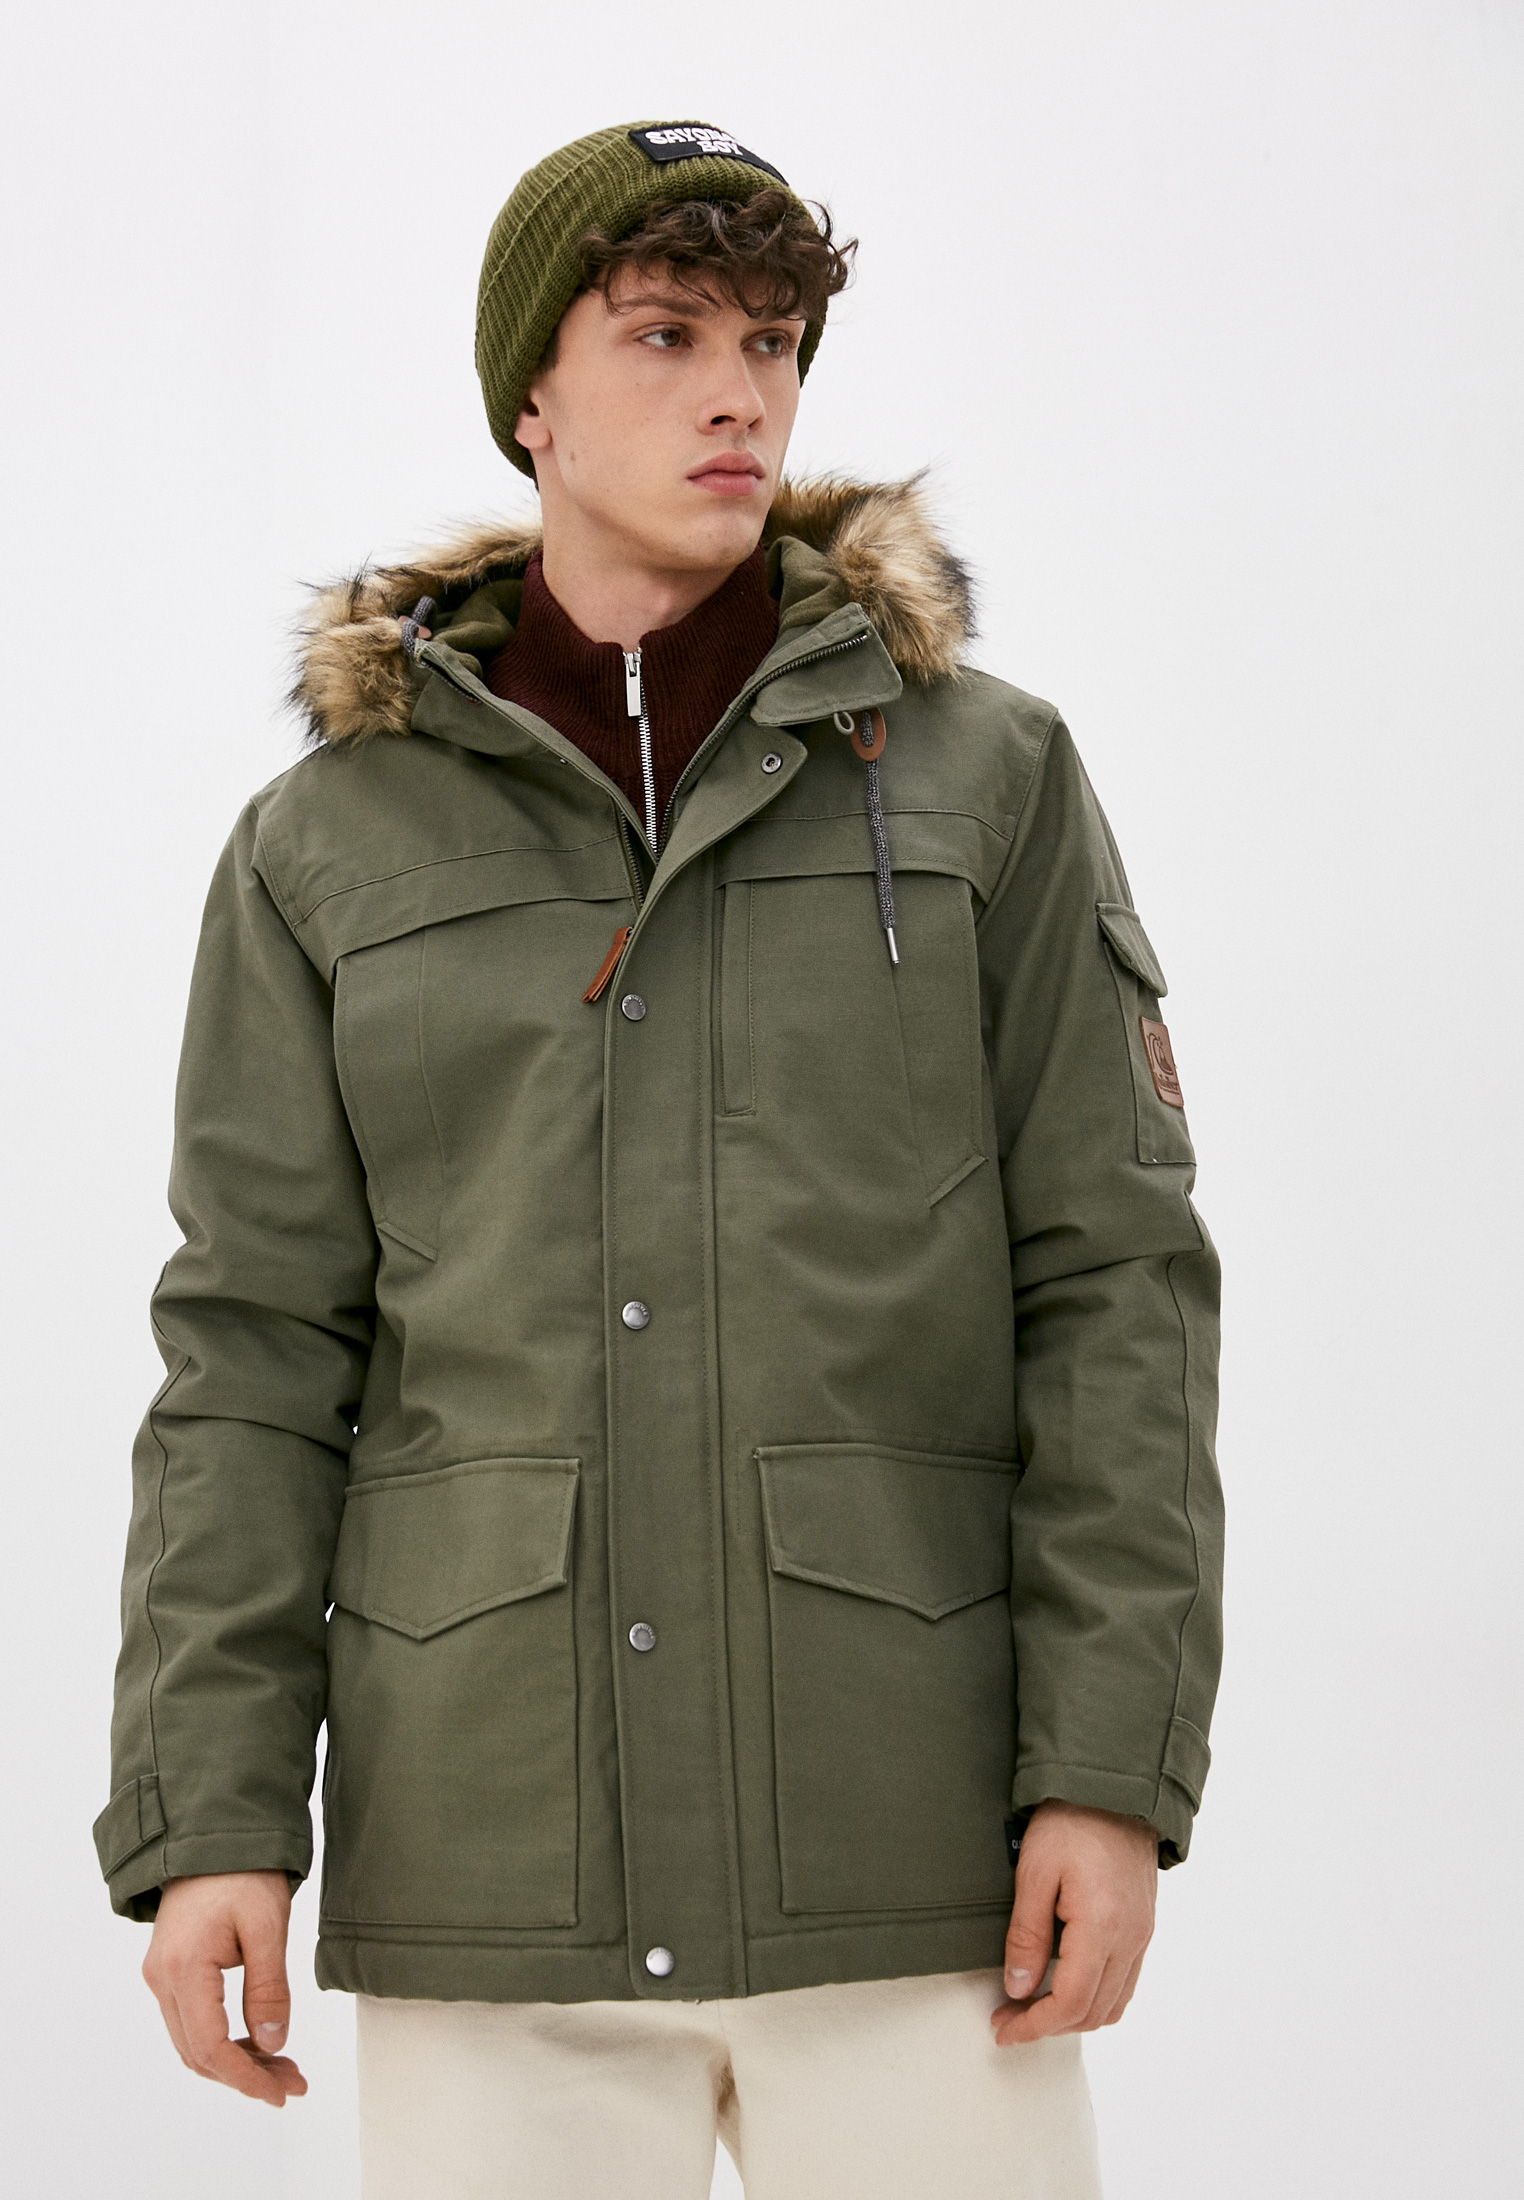 Утепленная куртка Quiksilver (Квиксильвер) Куртка утепленная Quiksilver